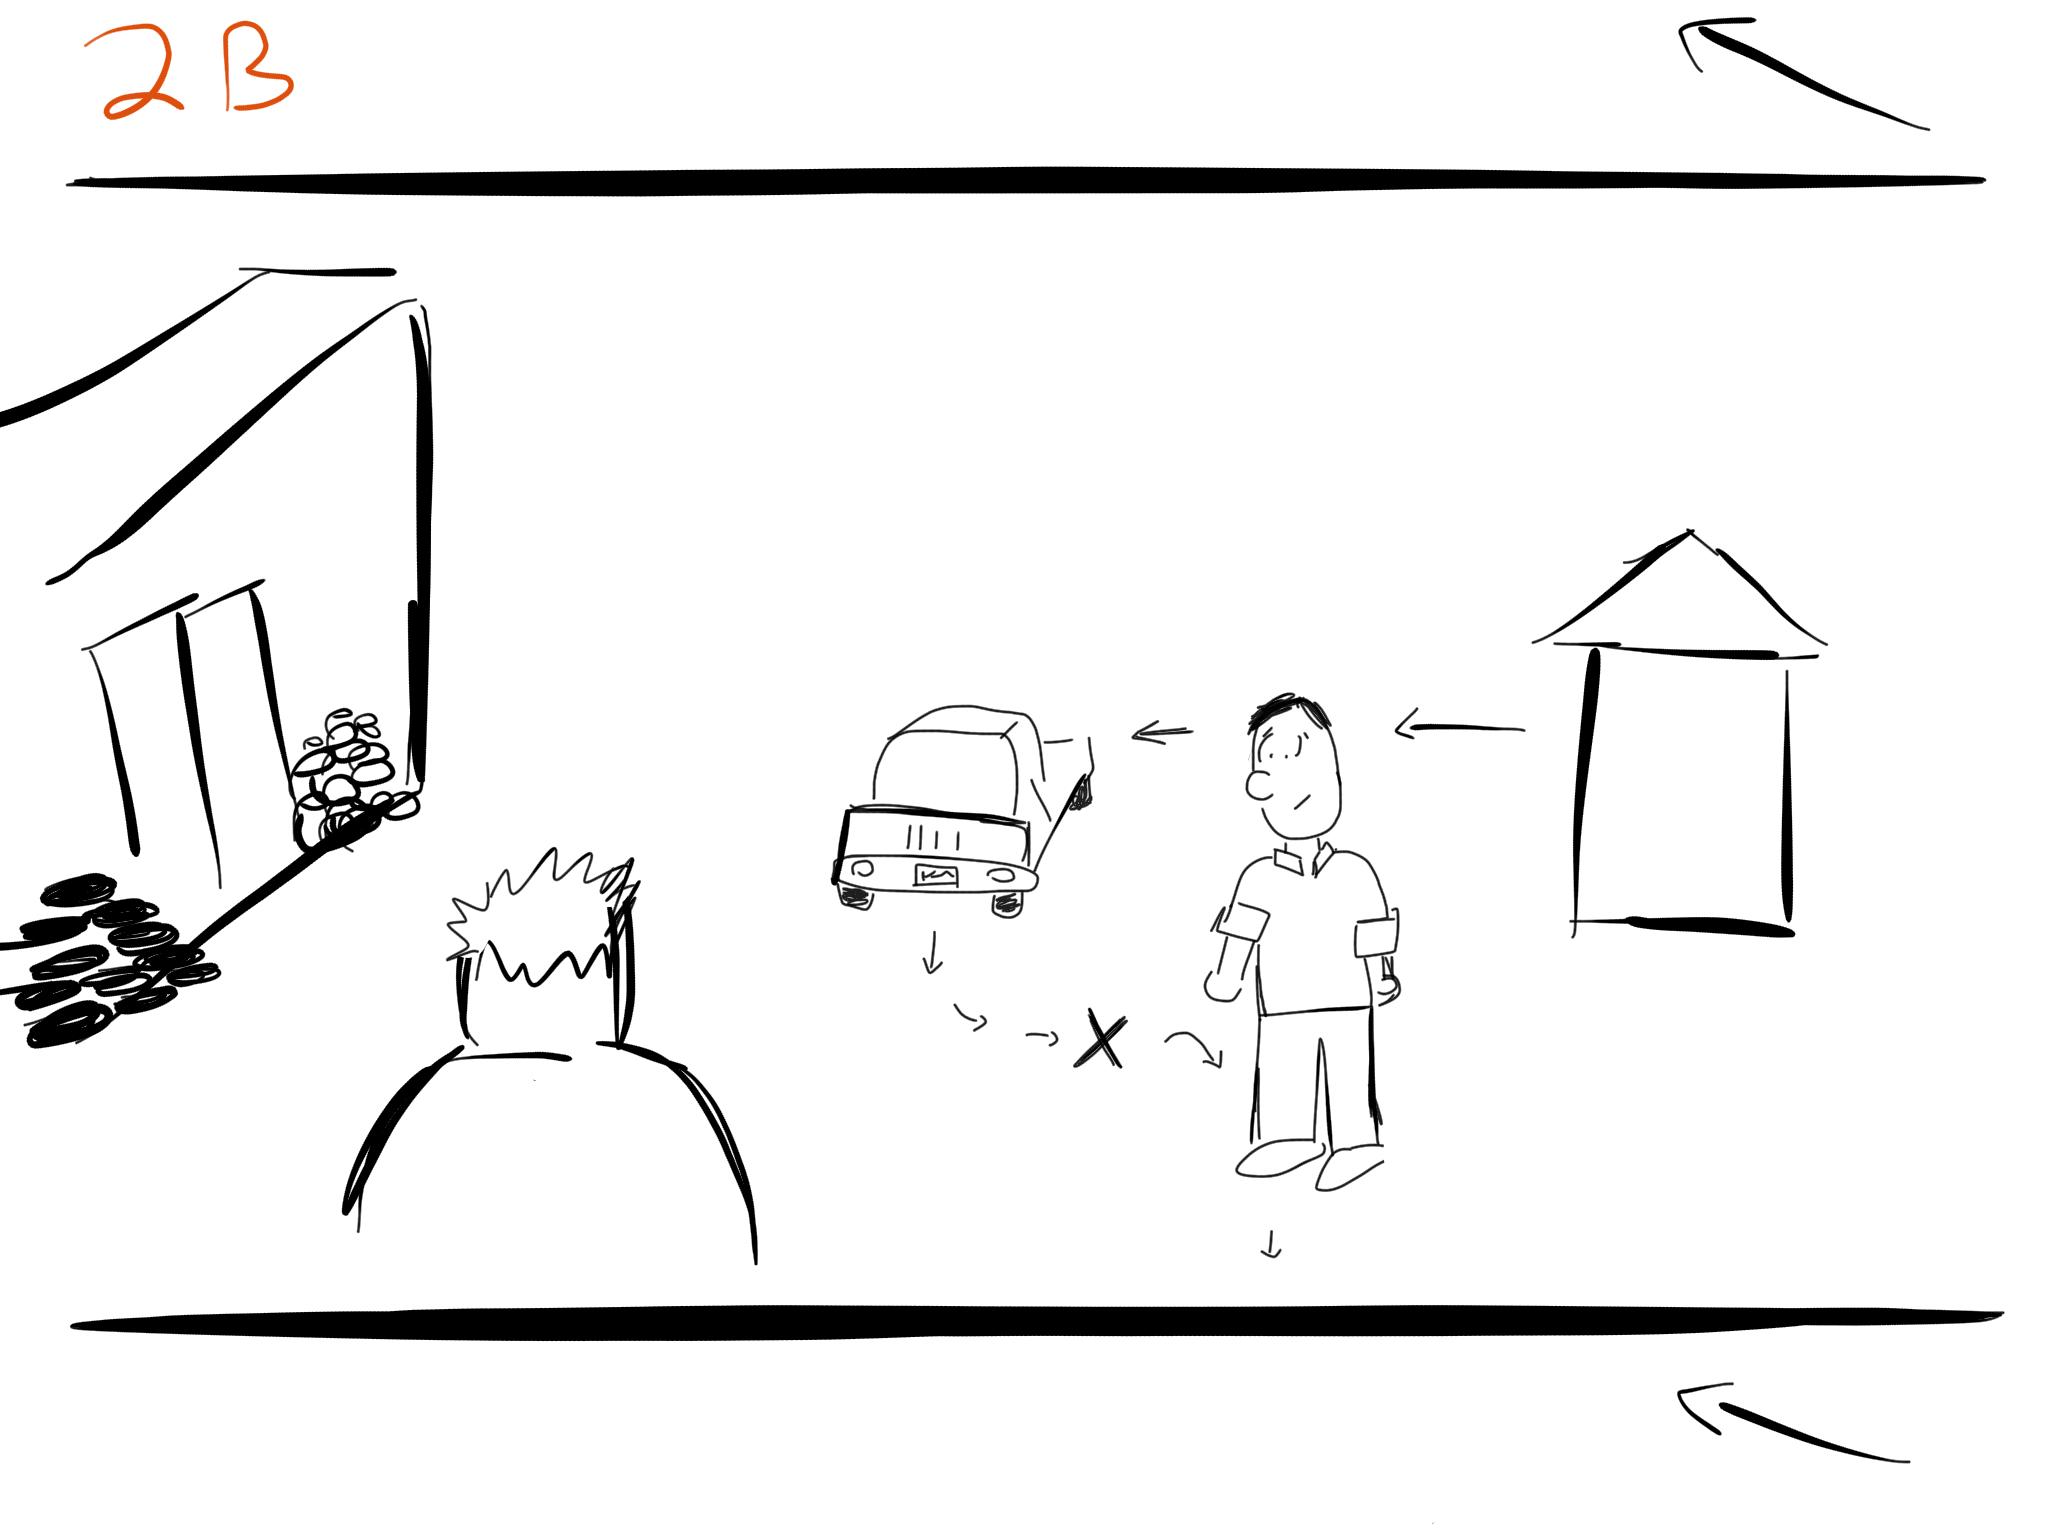 BDF_Storyboards_03.jpg